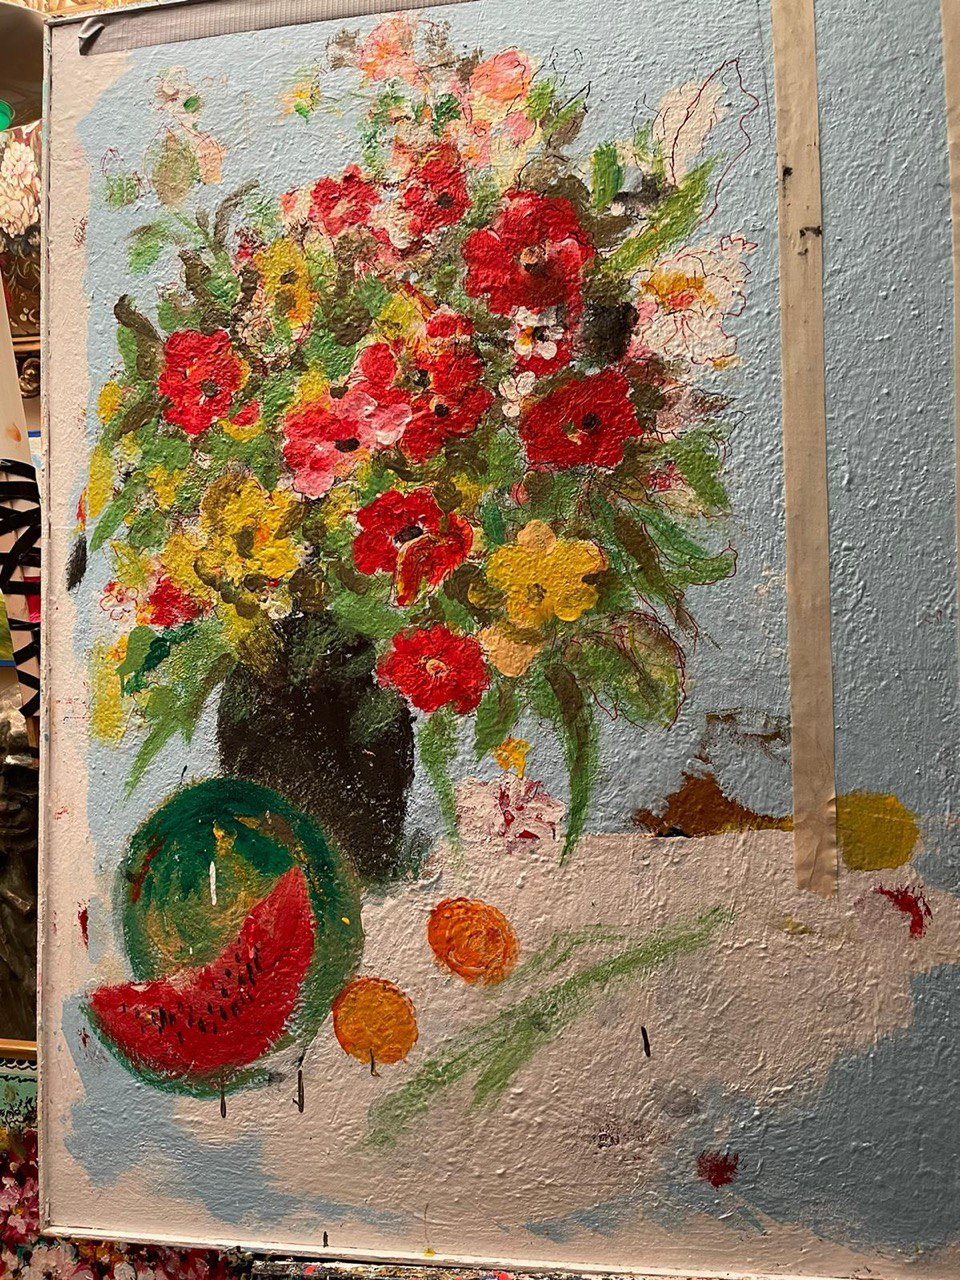 Mikhail Zvyagin Creates a New Painting to Celebrate His 90th Birthday